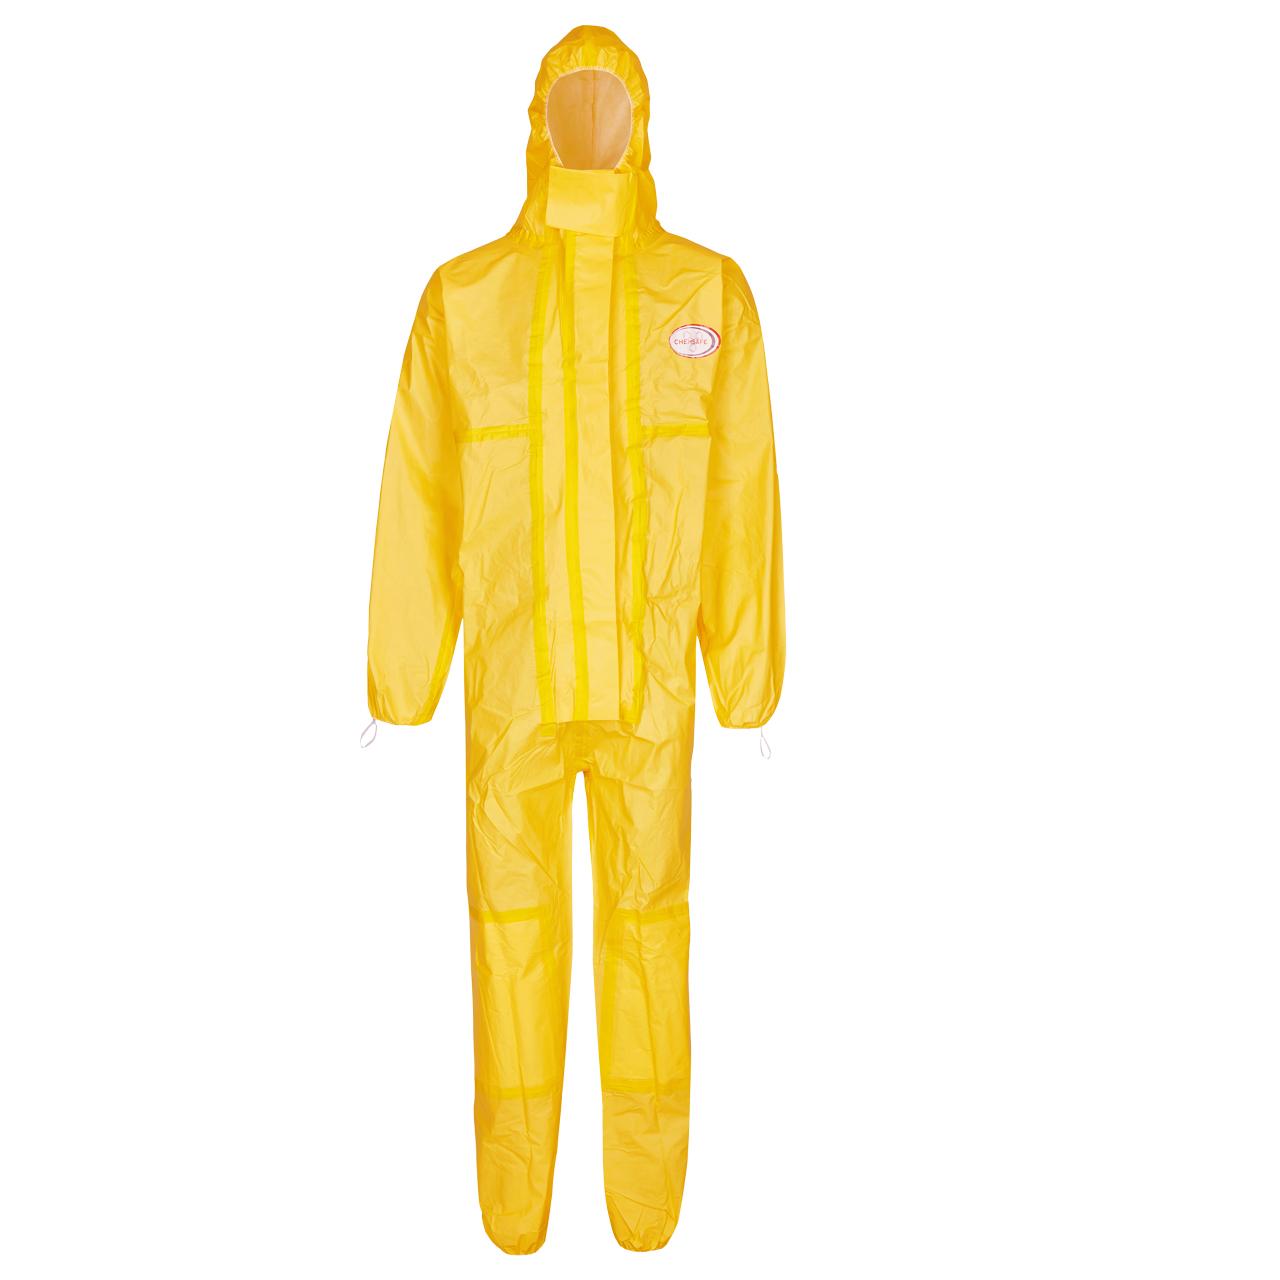 CoverChem® Chemikalienschutzoverall, Kat. III Typ 3B - 6B, Gr. XXL, *300 St. sofort verfügbar*